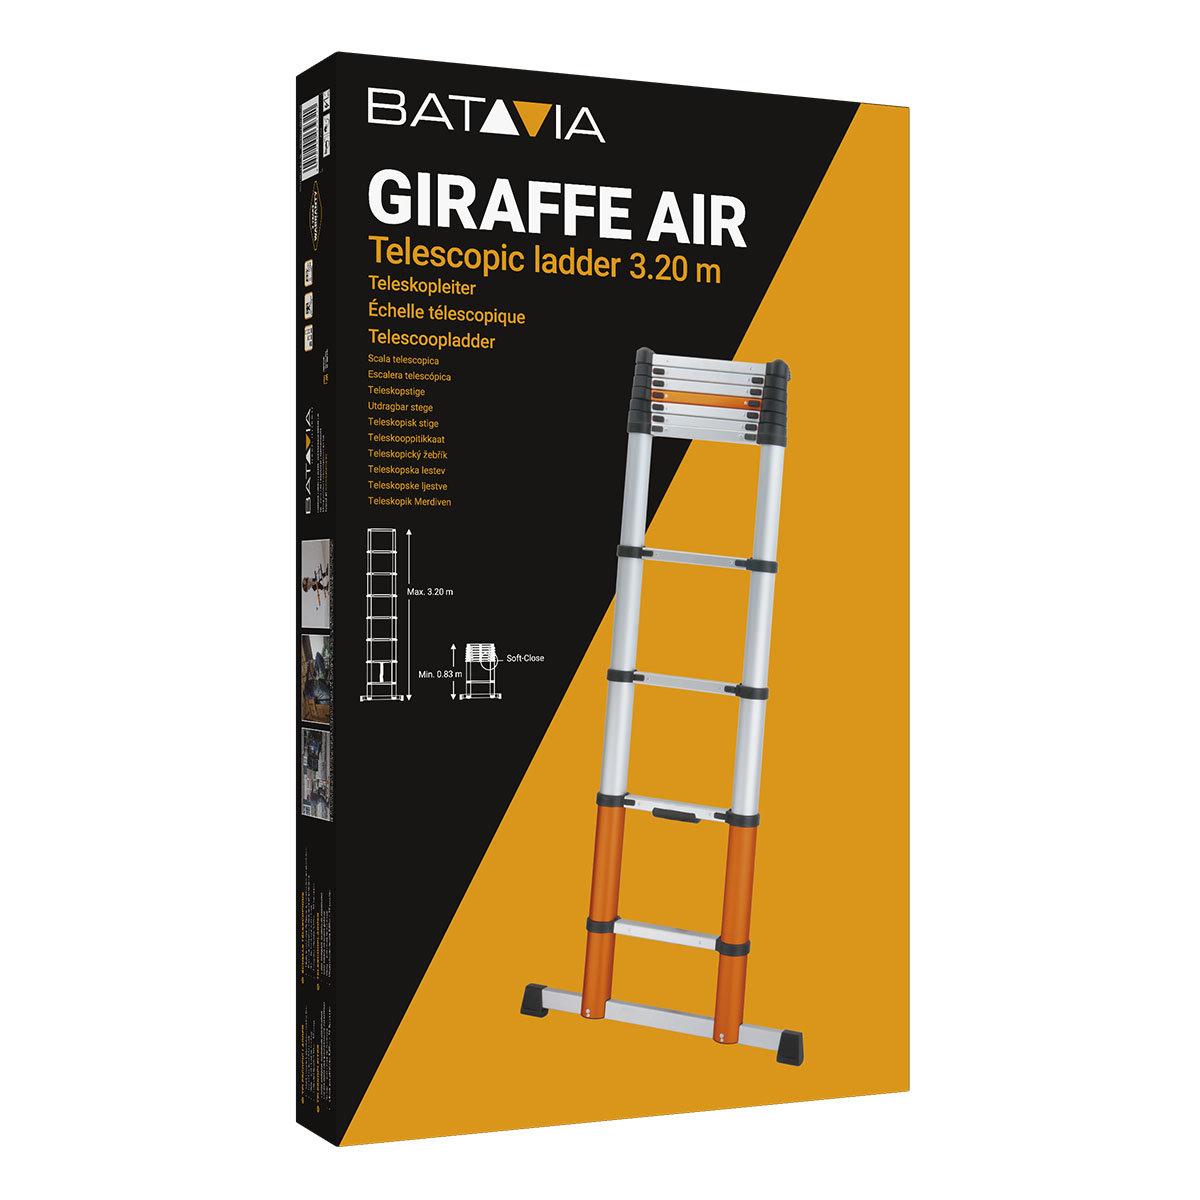 Teleskopleiter Giraffe Air 3,20 m mit Stand- & Quertraverse | #4